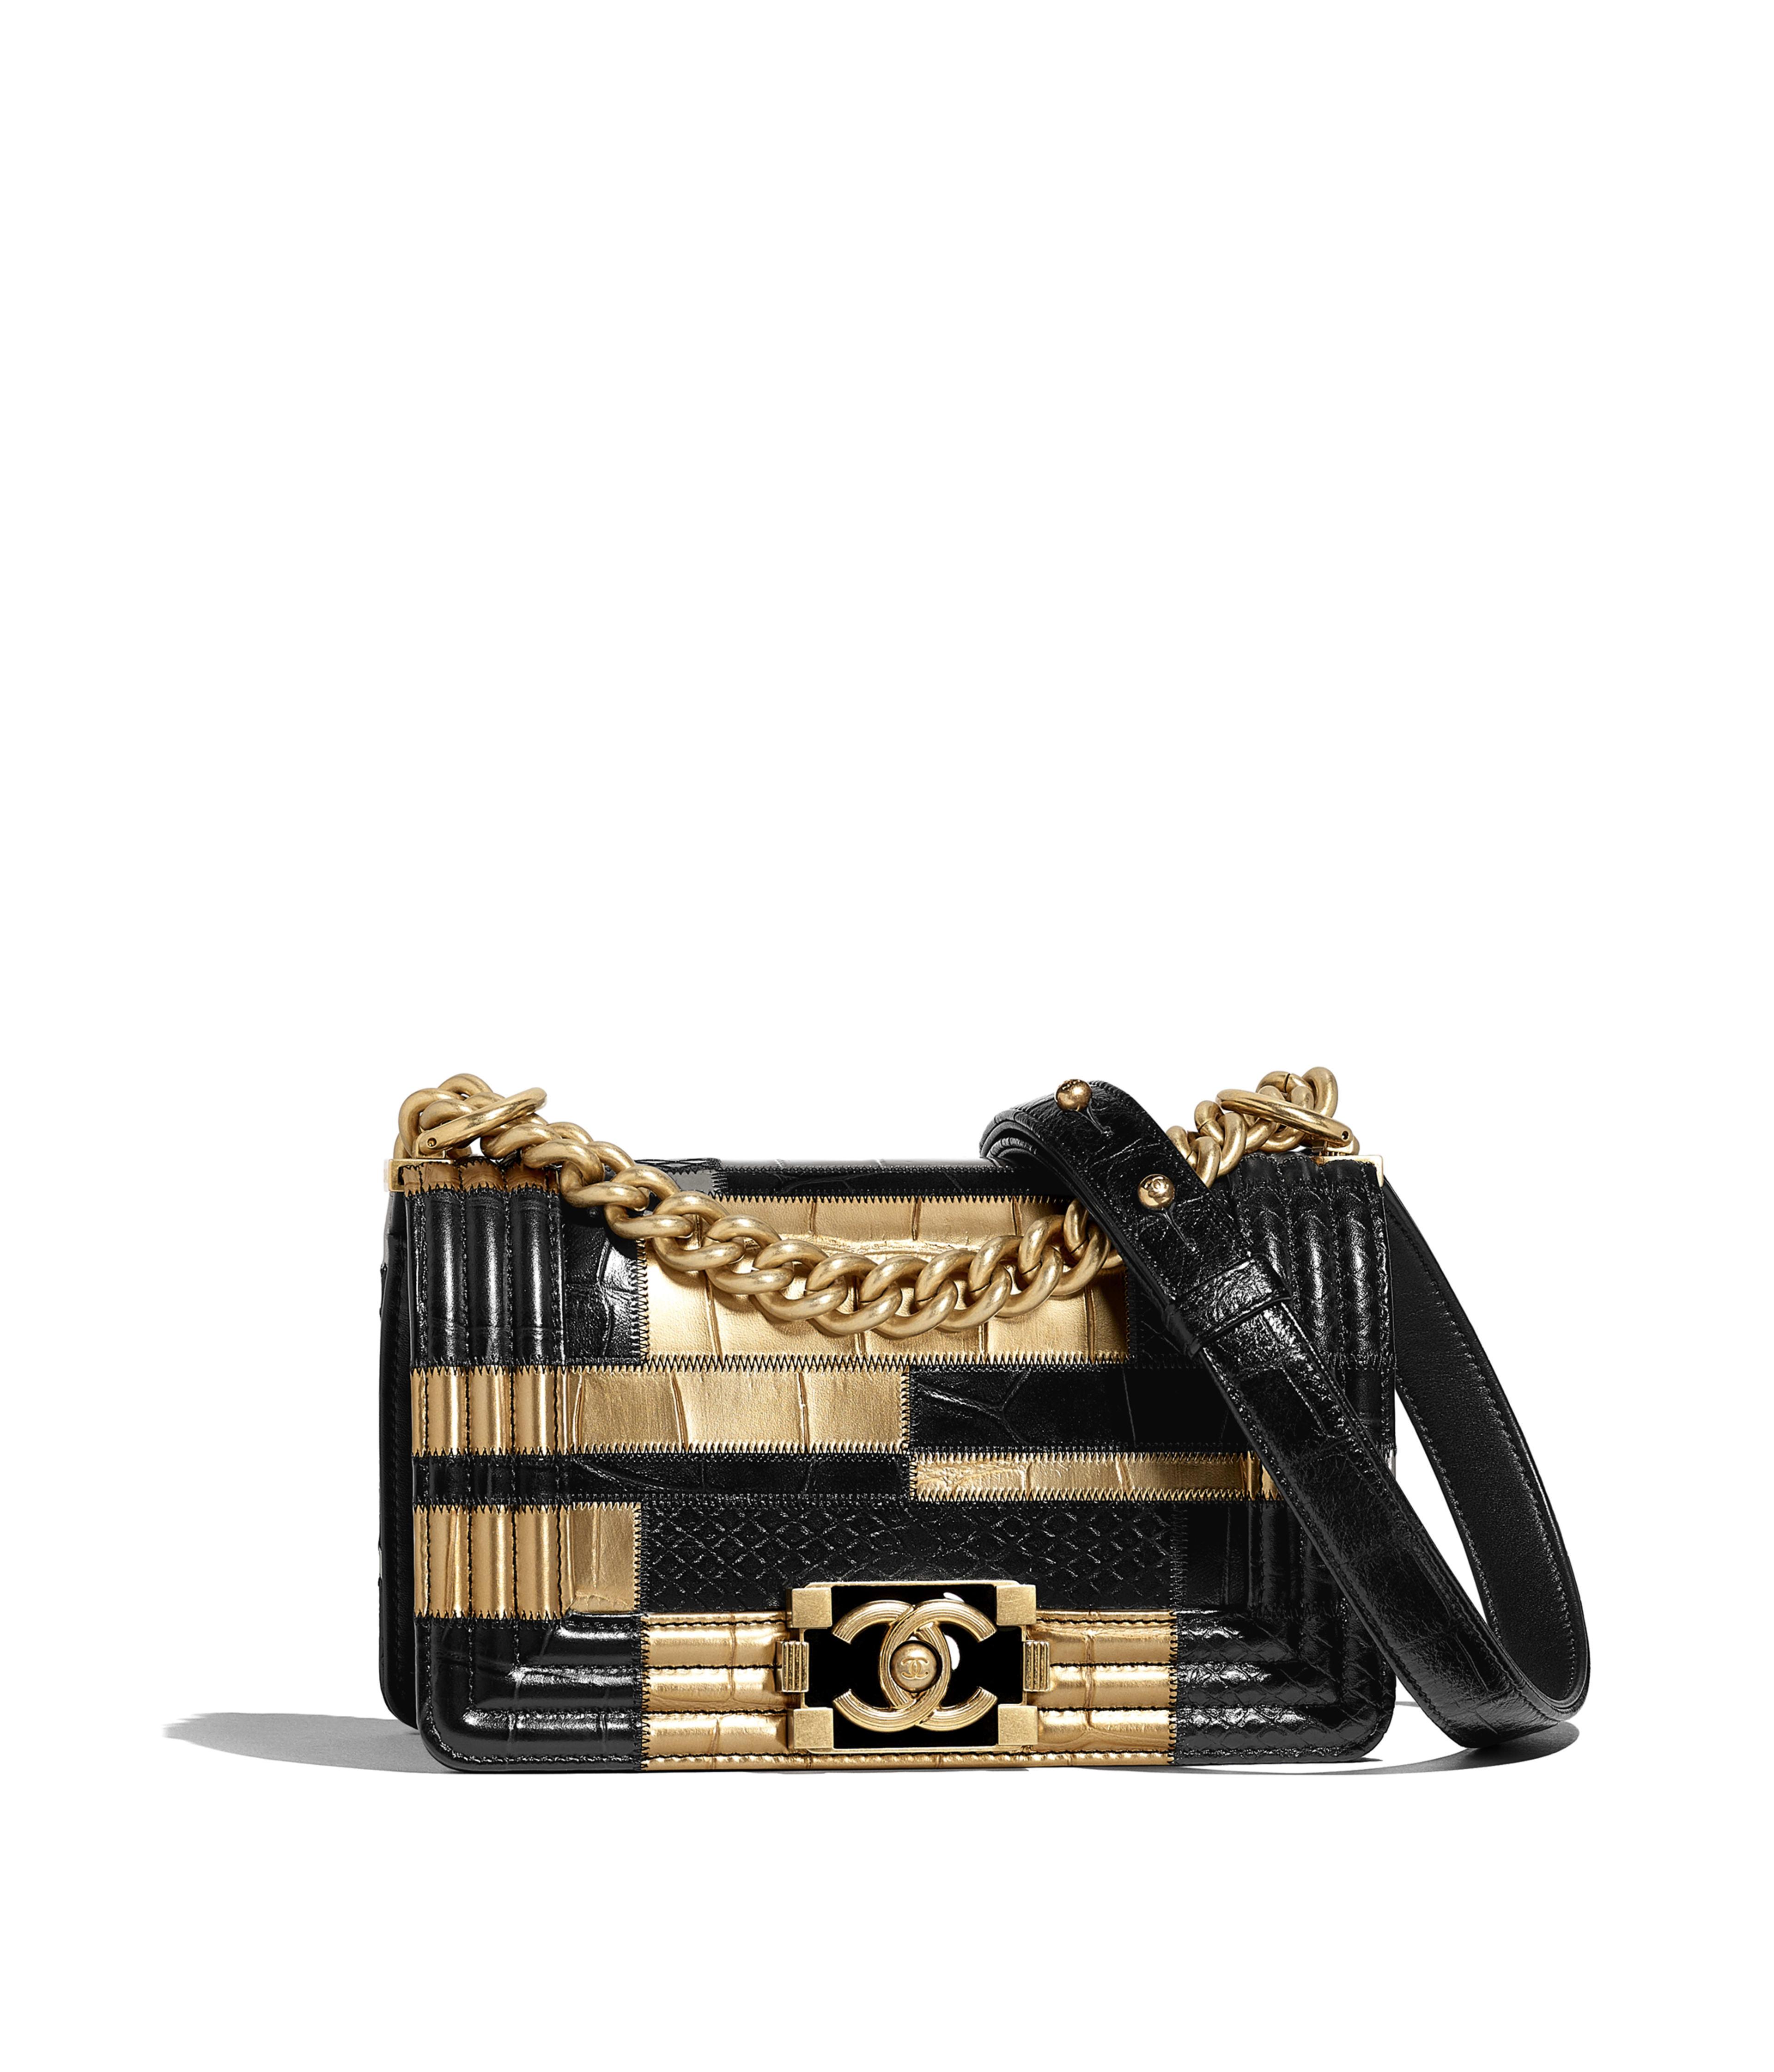 4729d3a44564 Small BOY CHANEL Handbag Crocodile Embossed Calfskin, Python Embossed  Calfskin & Gold-Tone Metal, Black & Gold Ref. A67085B00788N0784